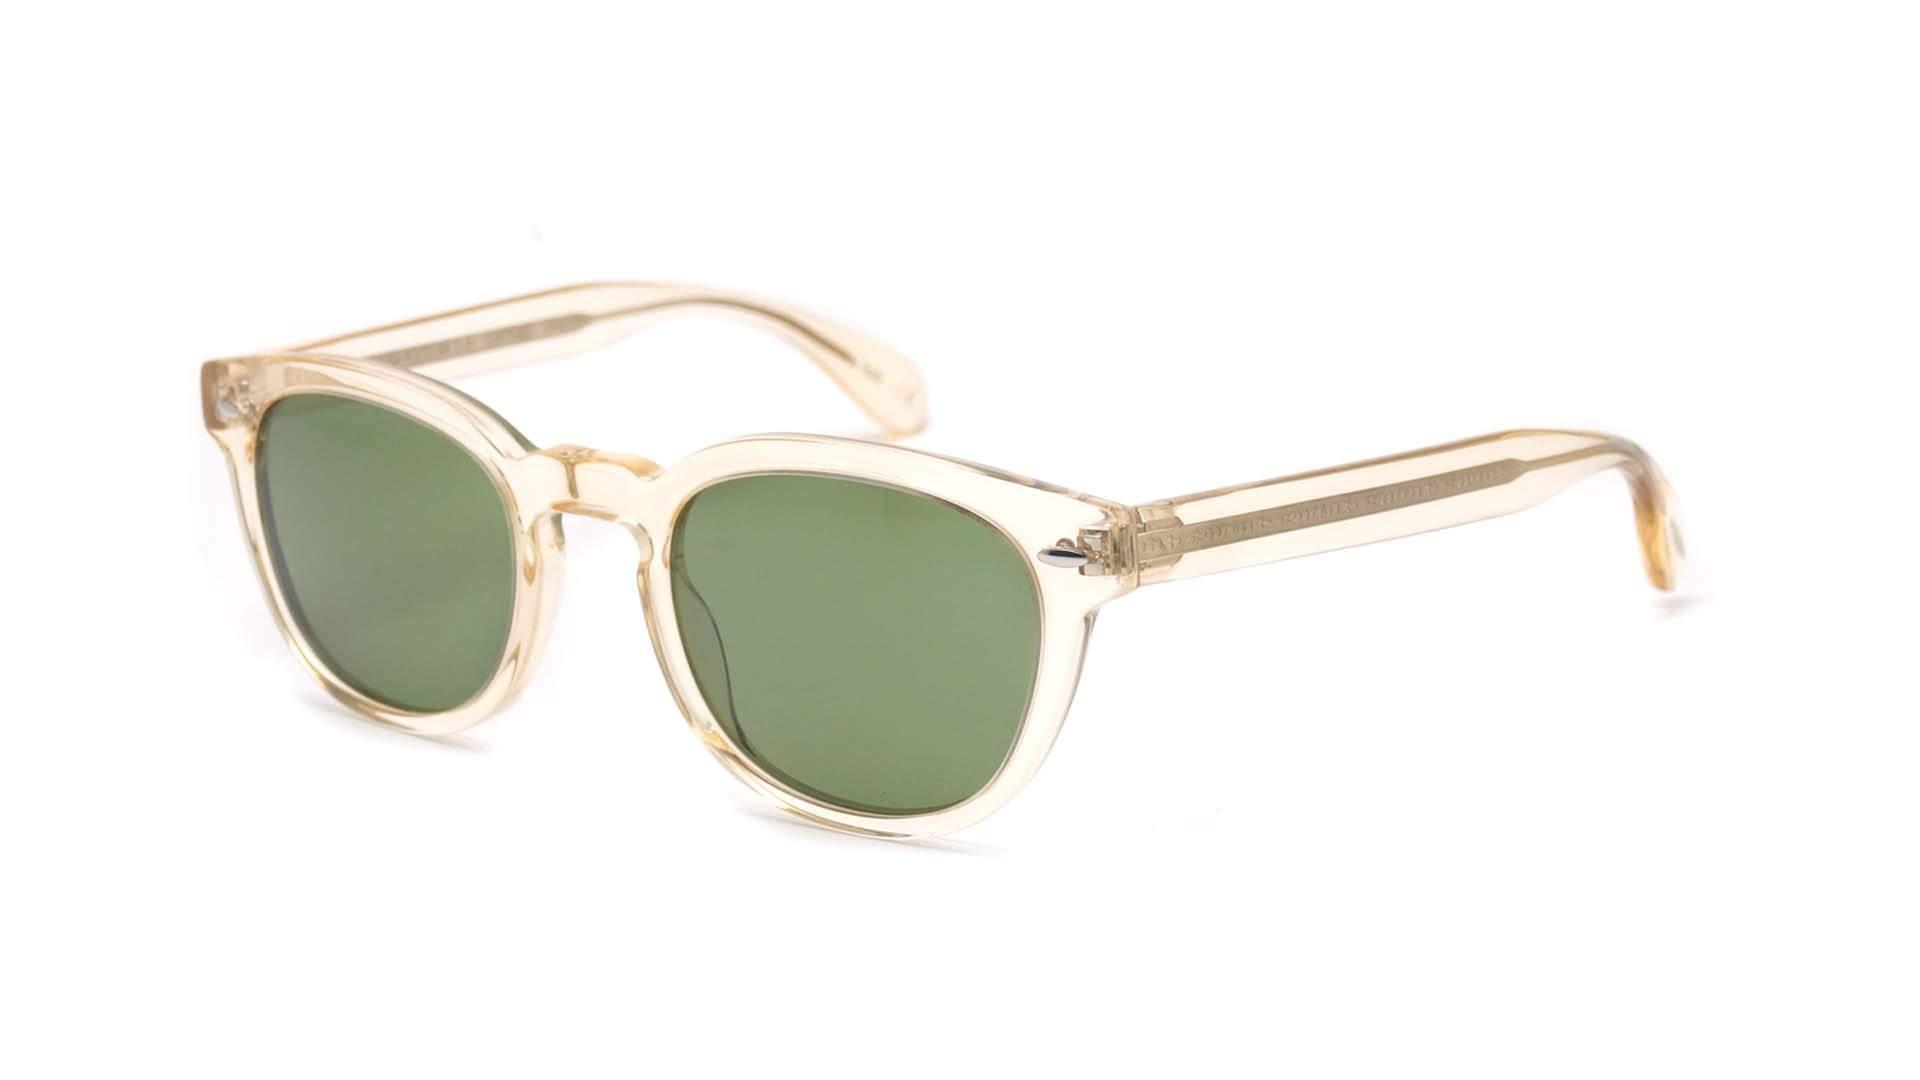 02de0a2b599 Sunglasses Oliver peoples Sheldrake sun Clear OV5036S 158052 47-22 Small